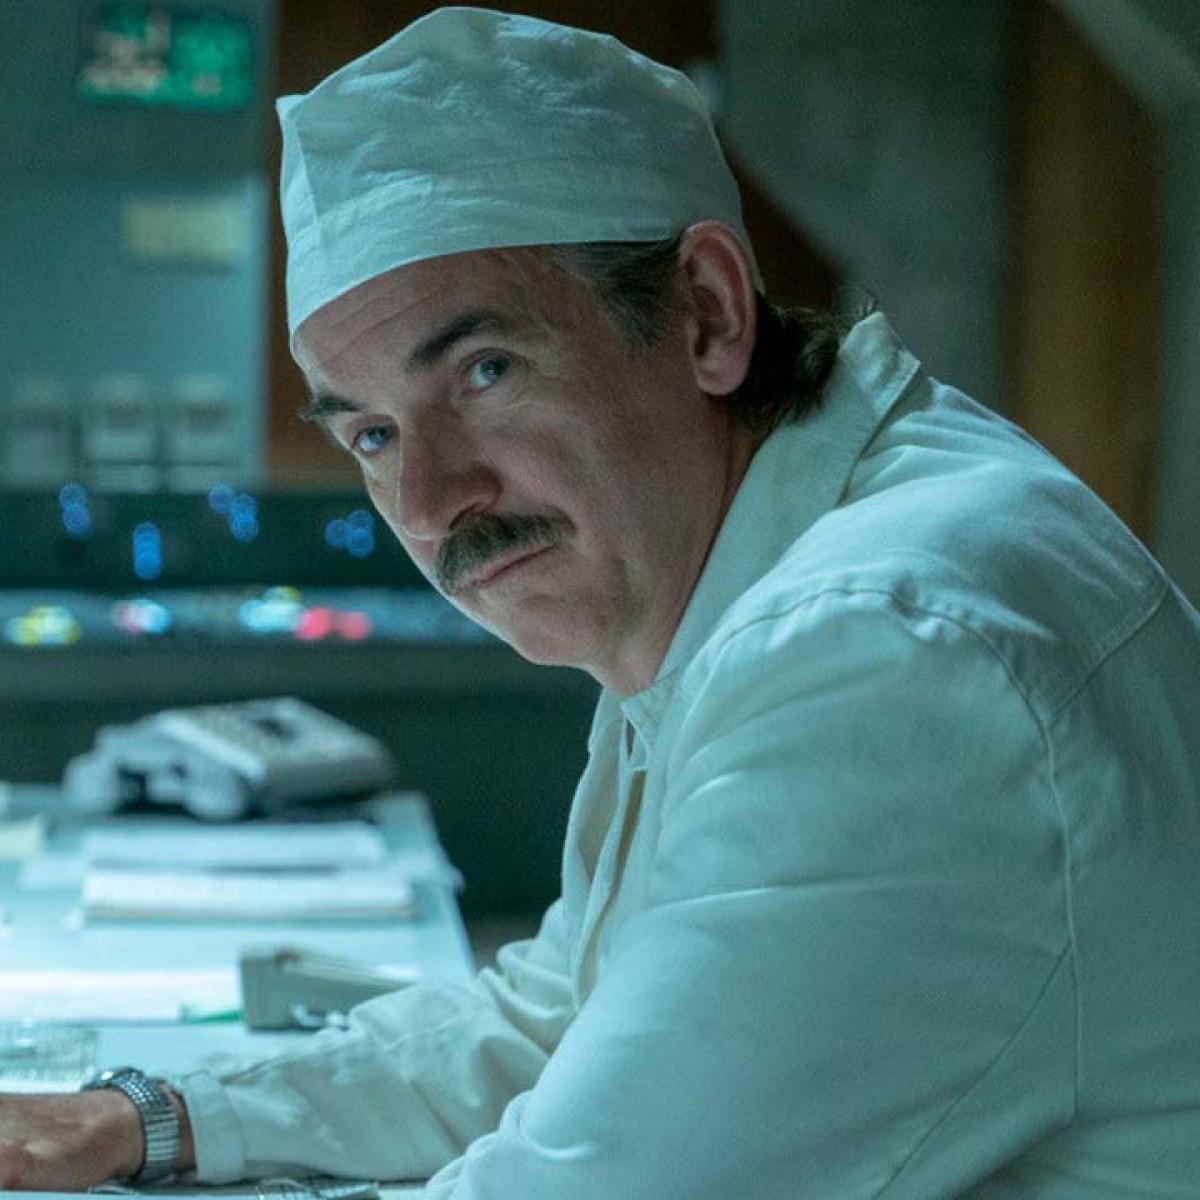 'Harry Potter', 'Chernobyl' actor Paul Ritter dies of brain tumour at 54